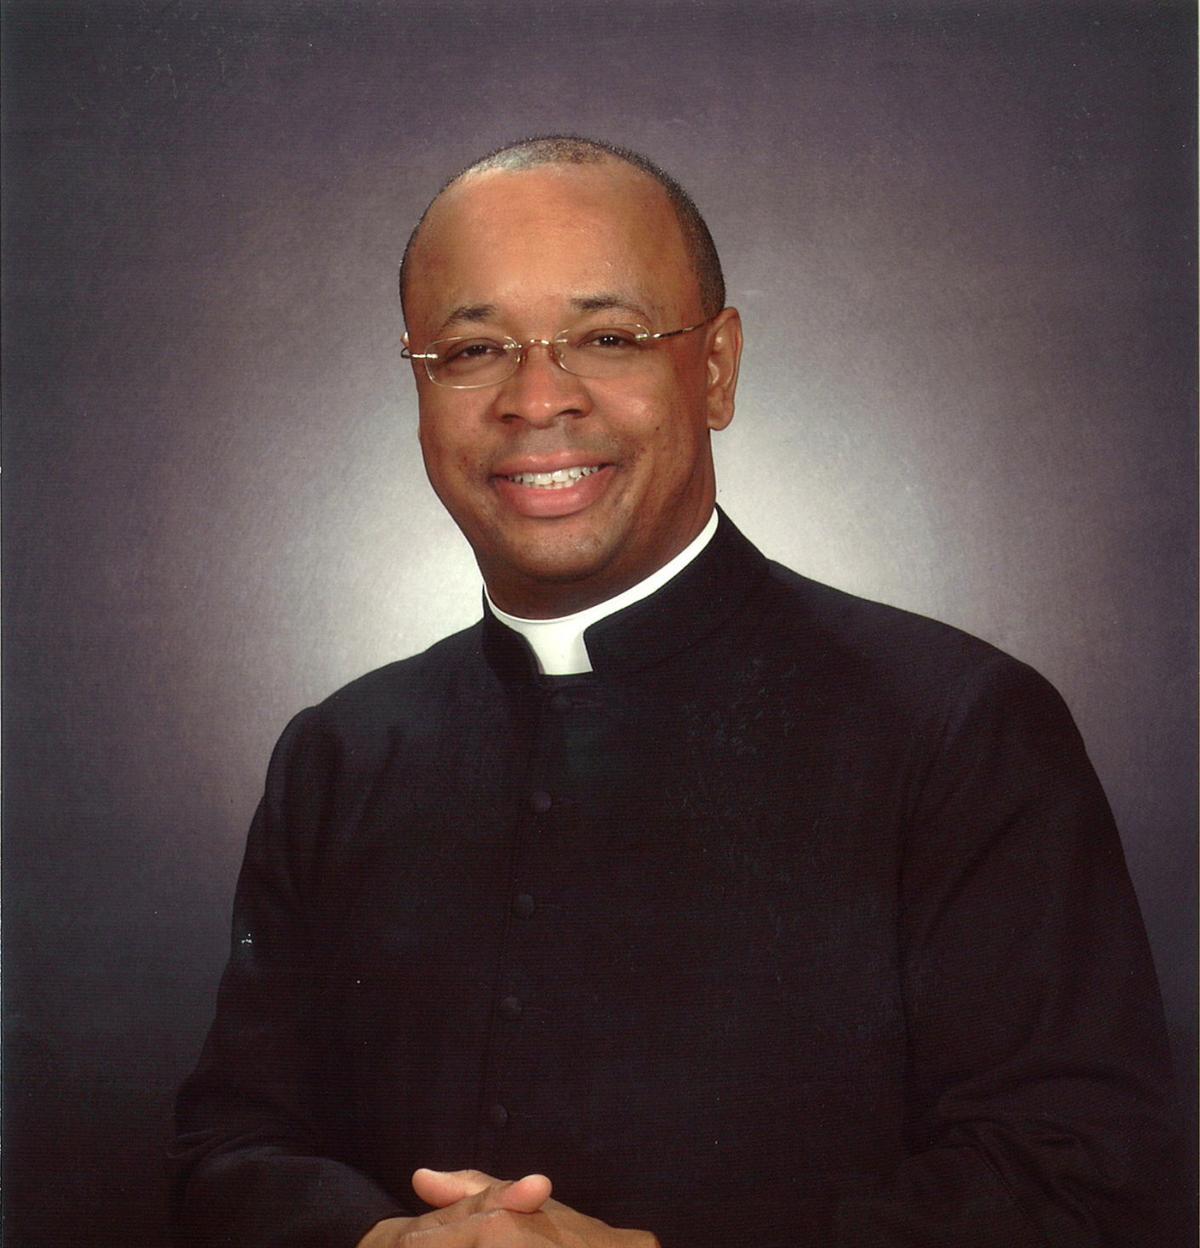 Black priest gets top honor from Catholic school ...